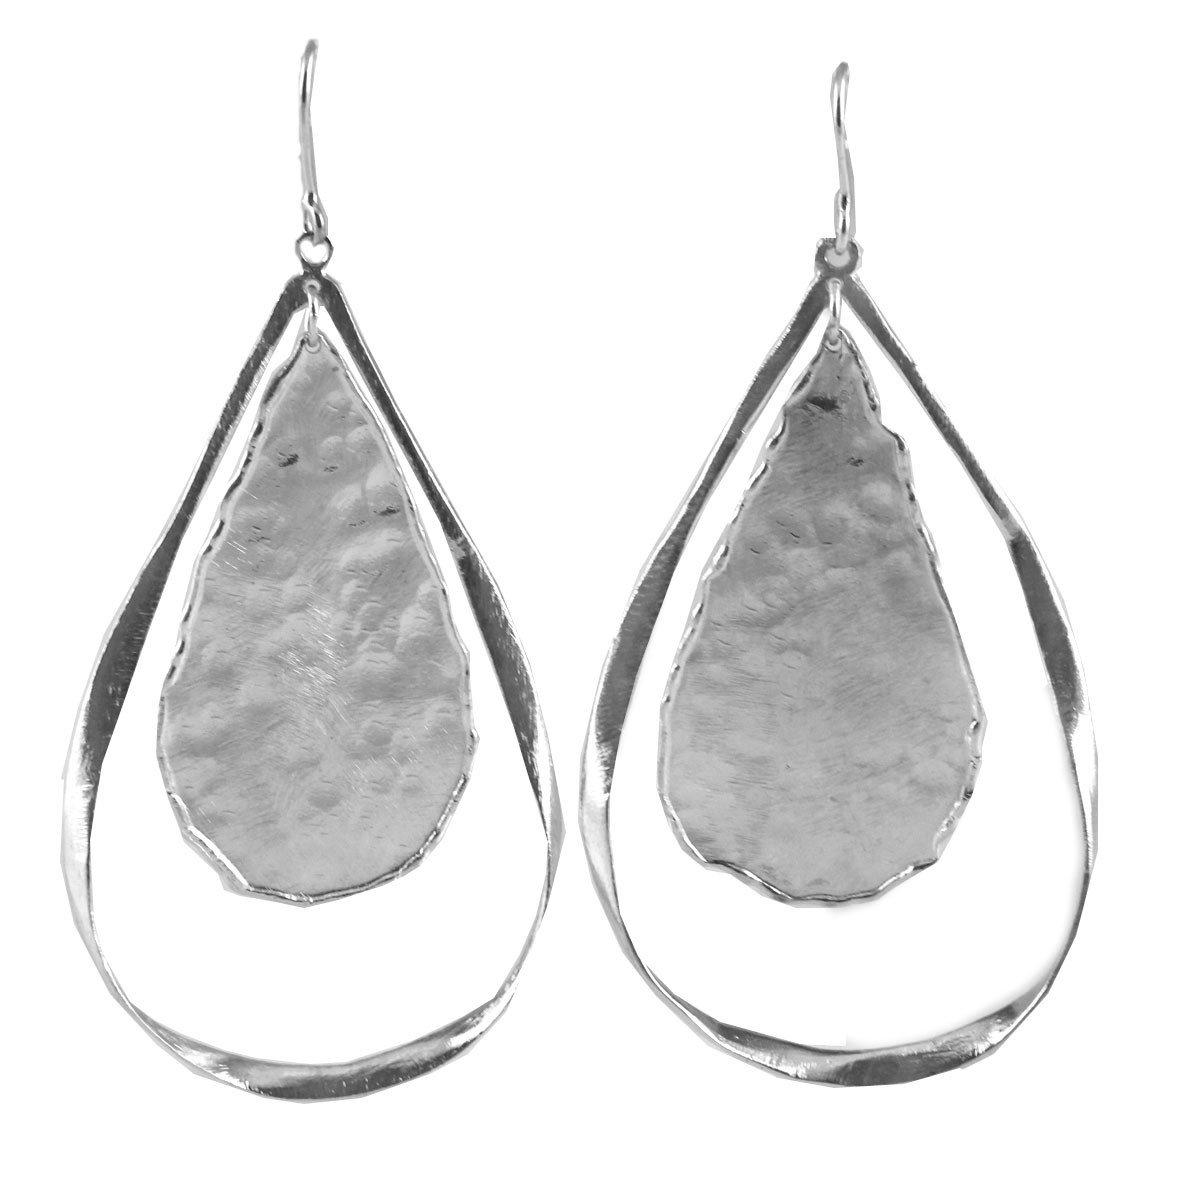 marcia_moran_cheryl_earrings_2_1024x1024@2x.jpg